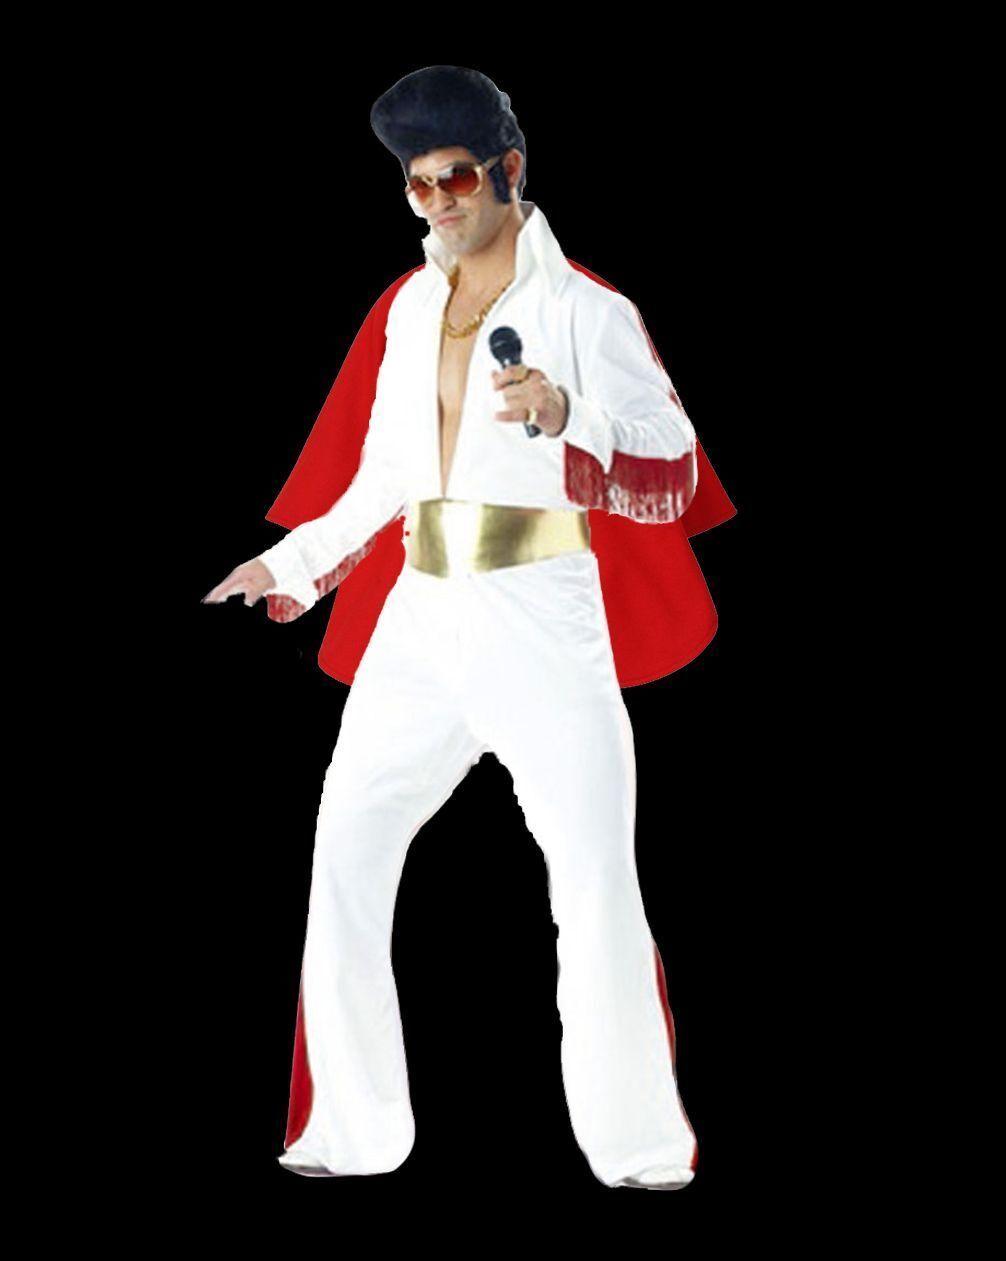 Adult Mens Presley 1950s King Of Rock N Roll White Jumpsuit Costume Fancy  Dress 9201d2cc15c8